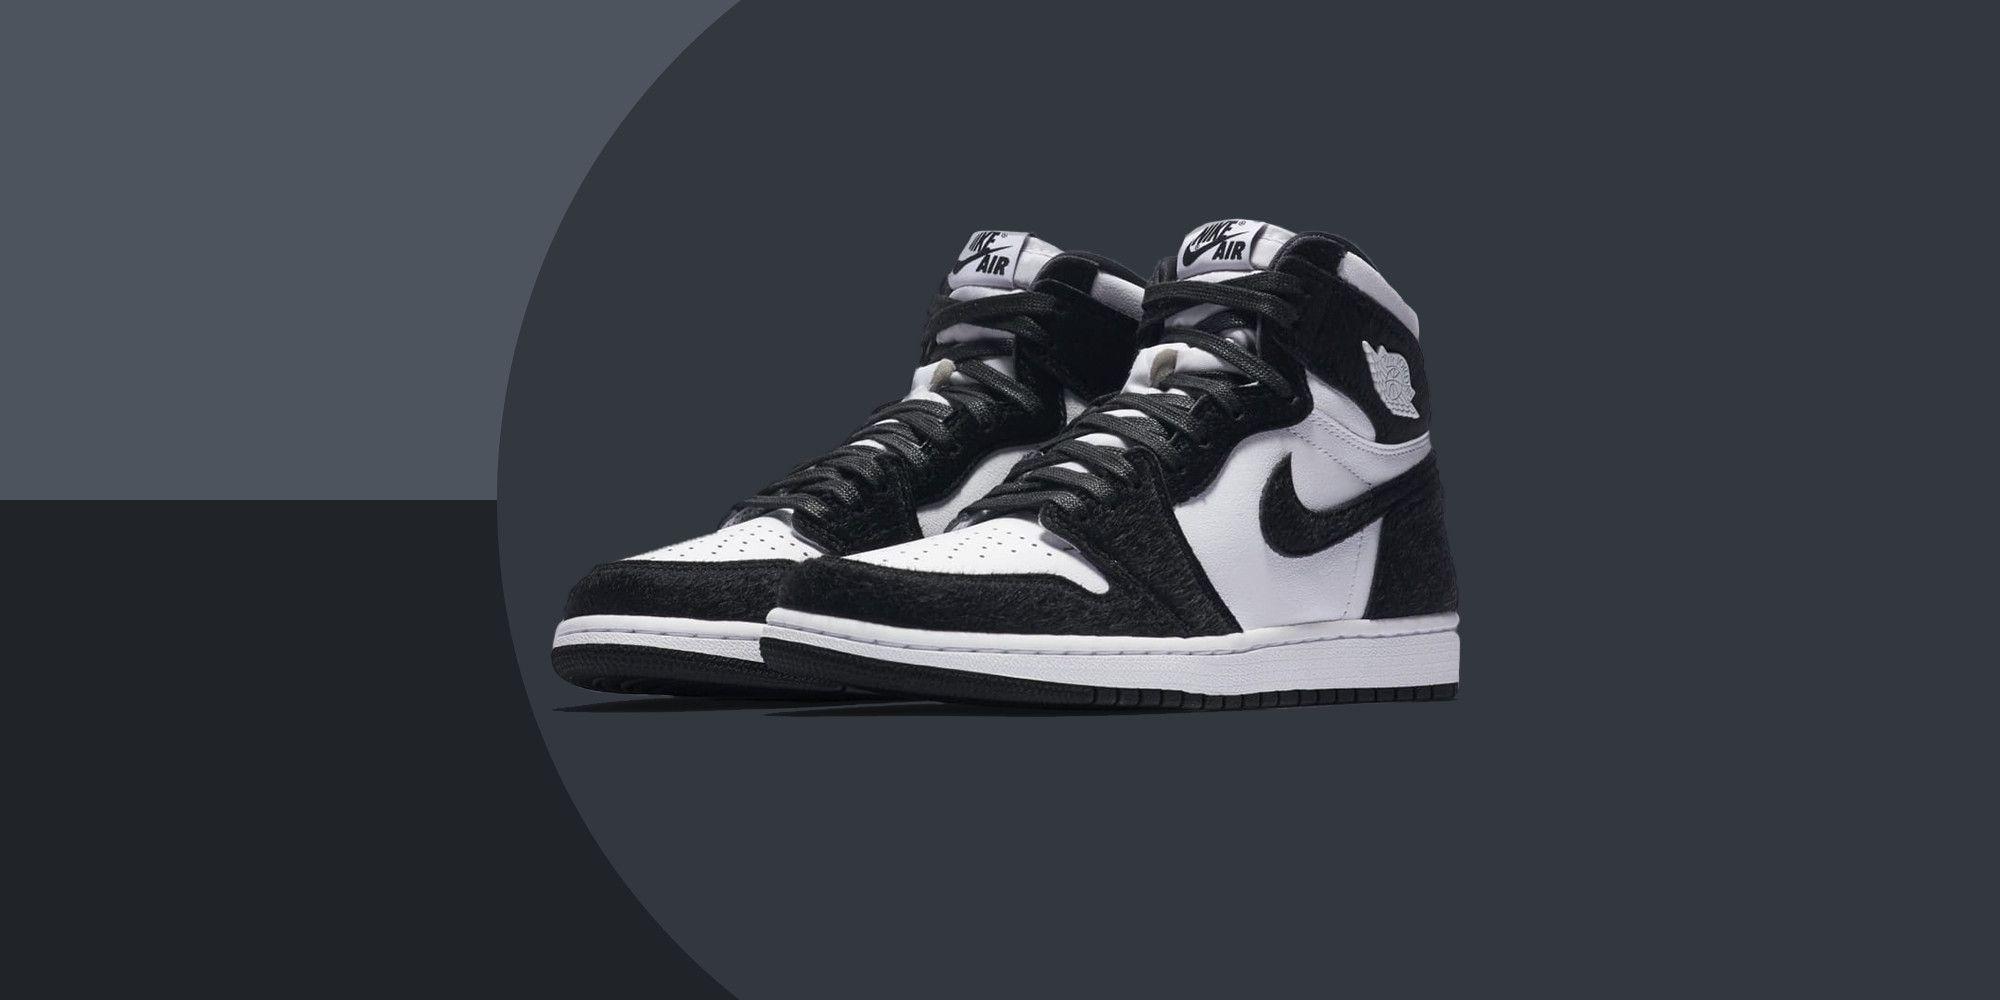 From Jordan, Adidas, Nike, and more.